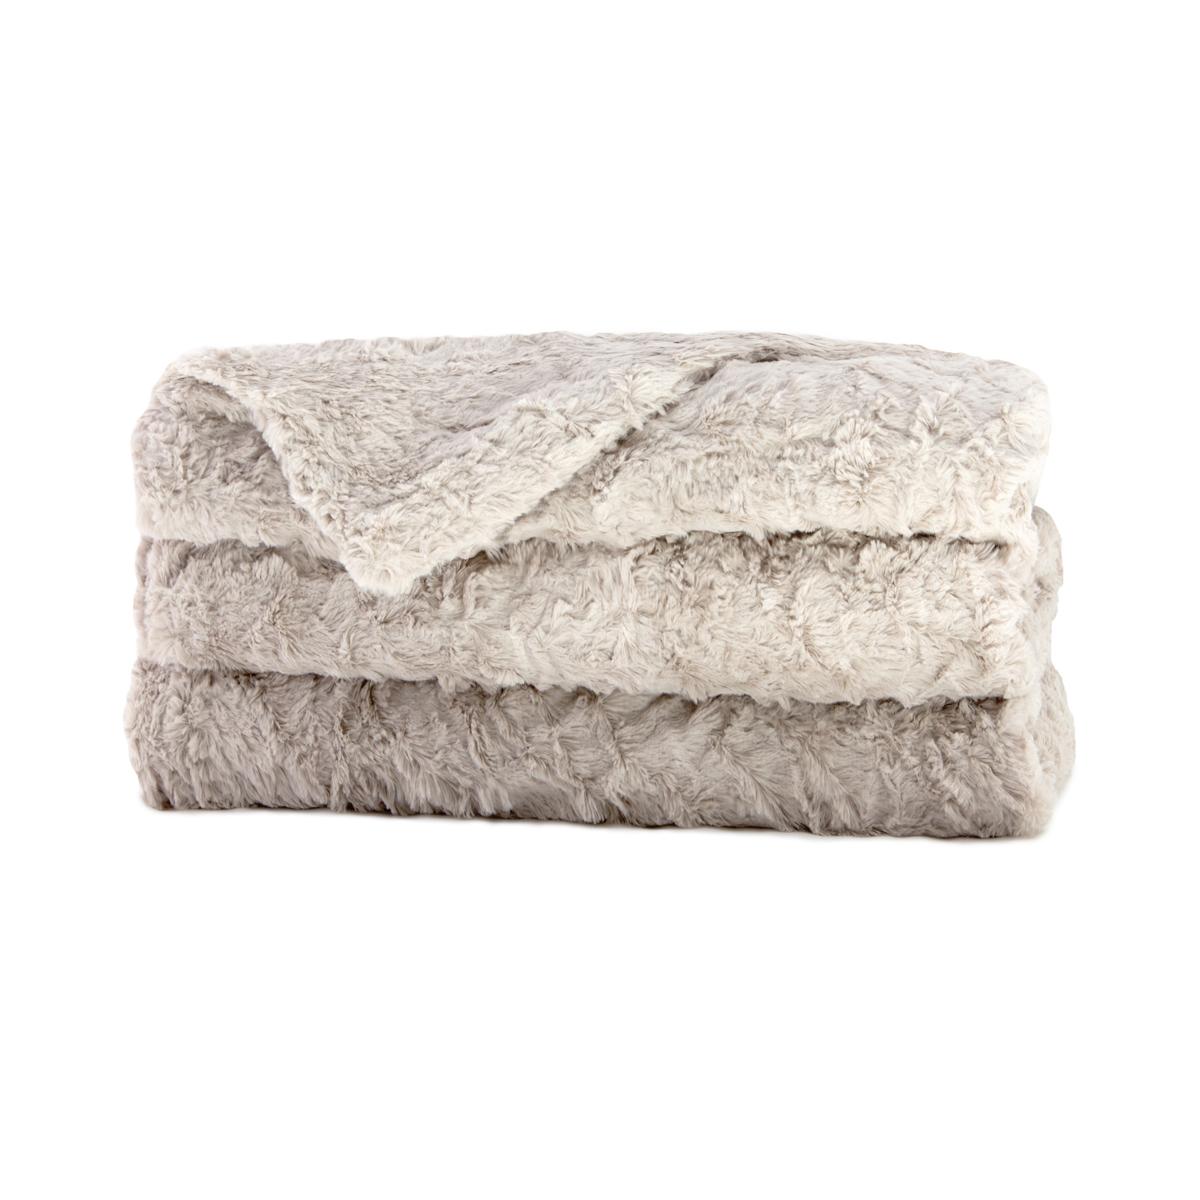 Sunbeam® Royal Mink Plush Heated Throw – Light Grey TST8VS RP04  #423125